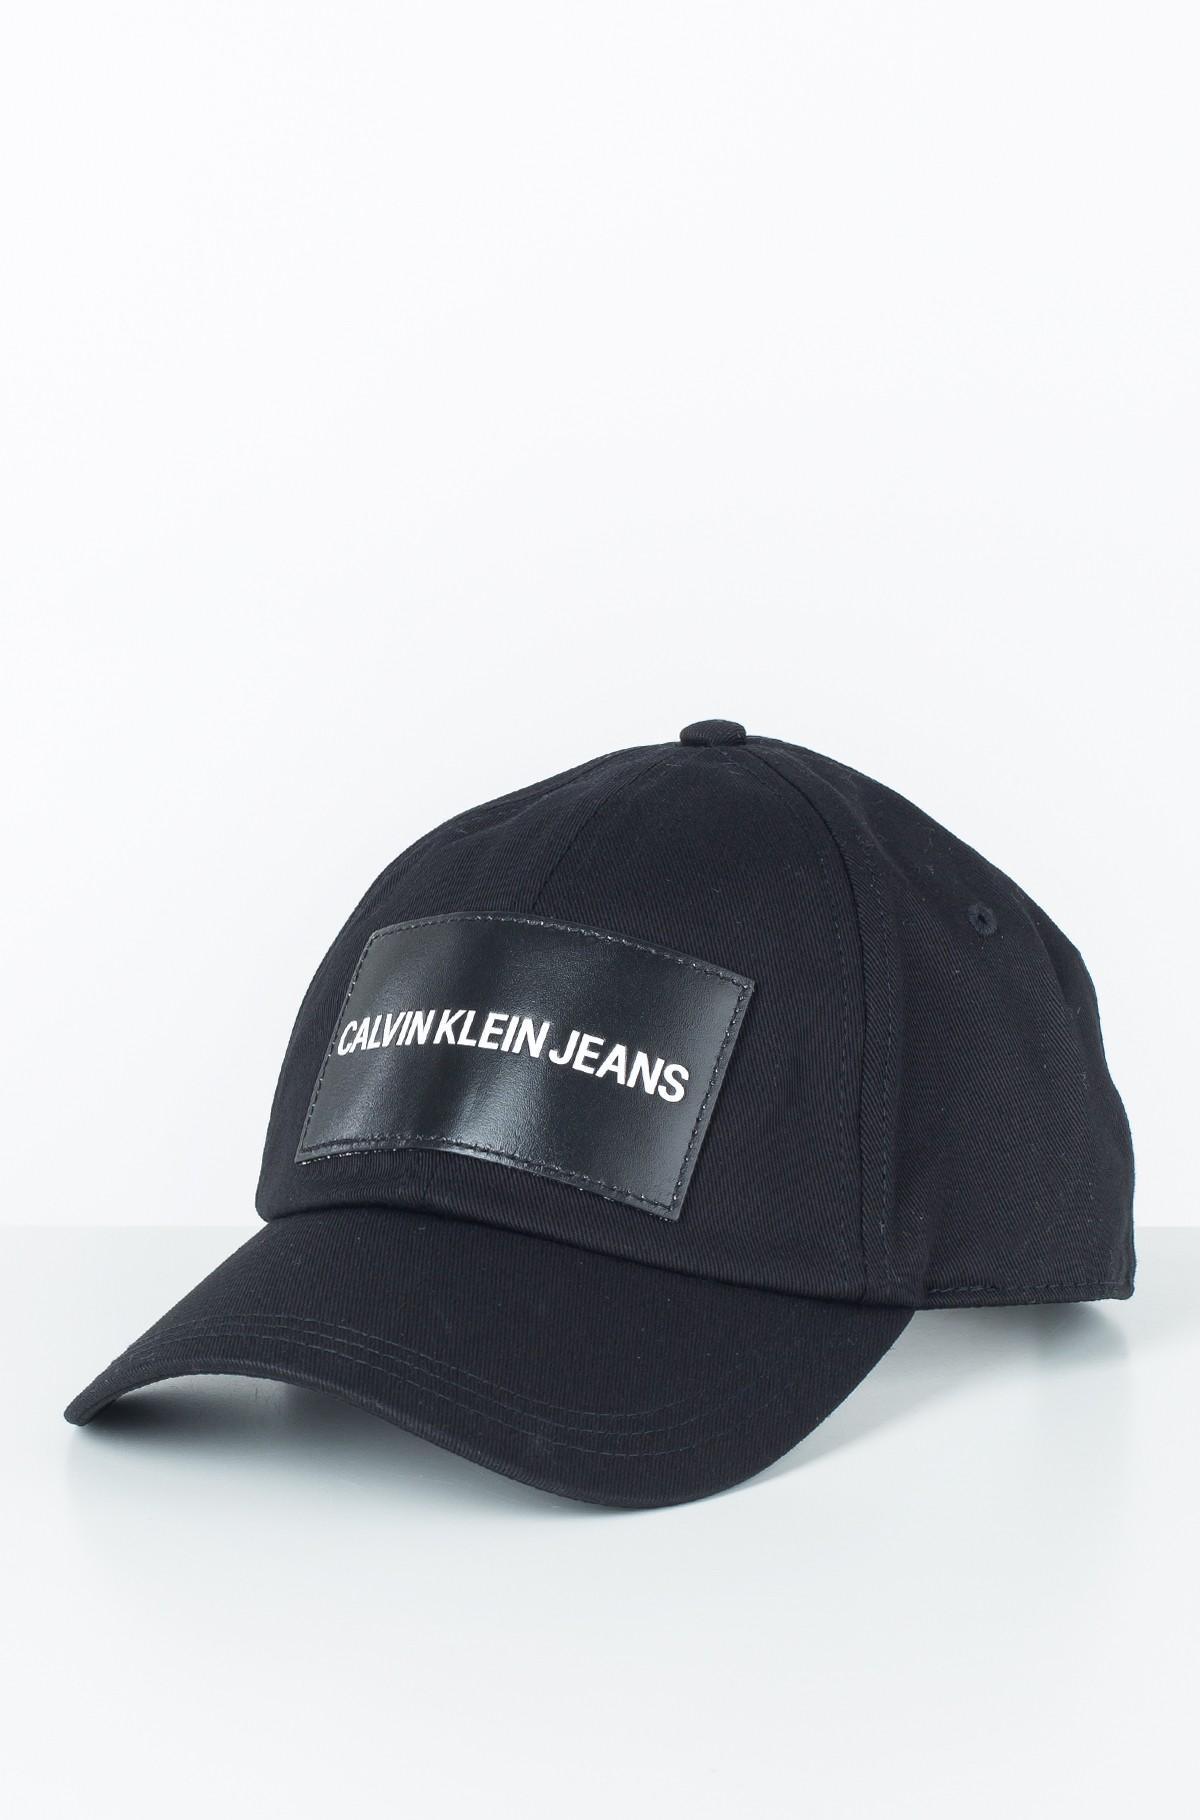 Kepurė su snapeliu  J CALVIN KLEIN JEANS CAP M-full-1